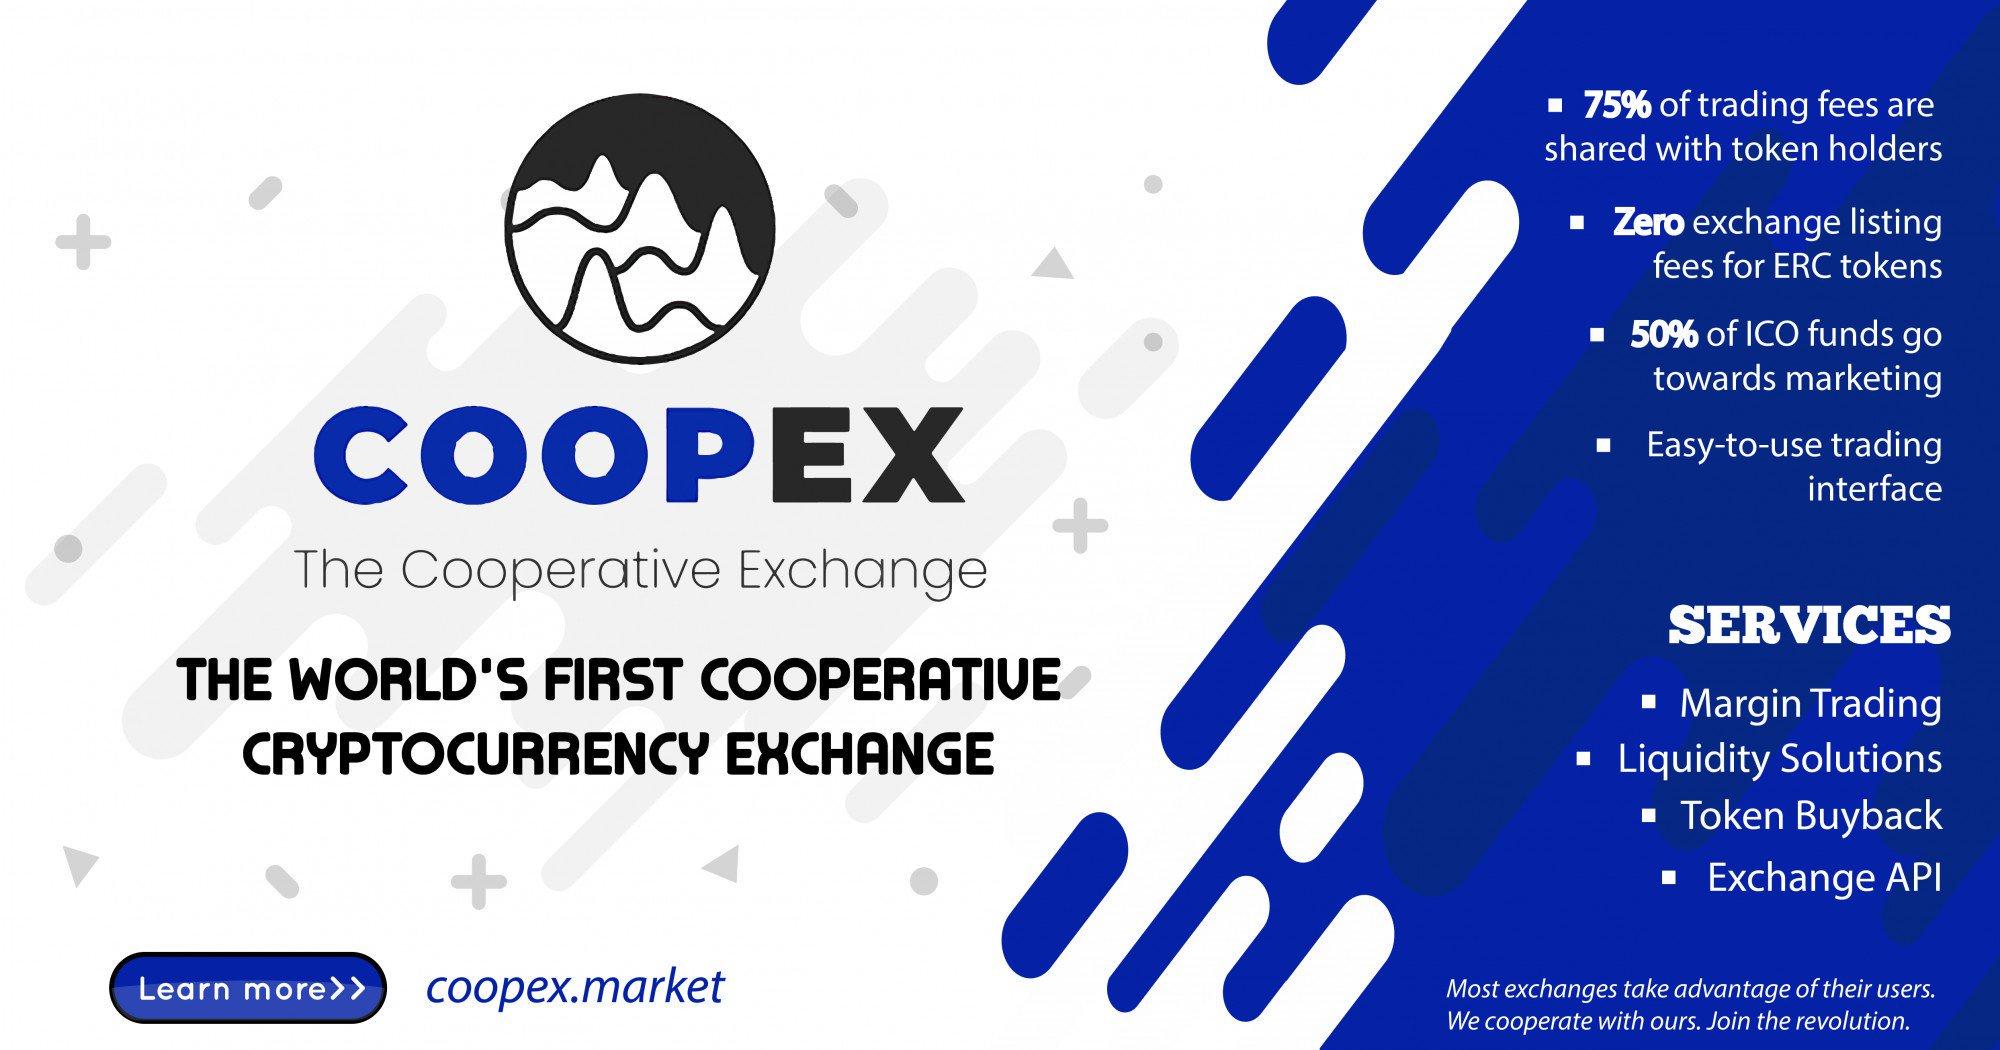 coopex_image